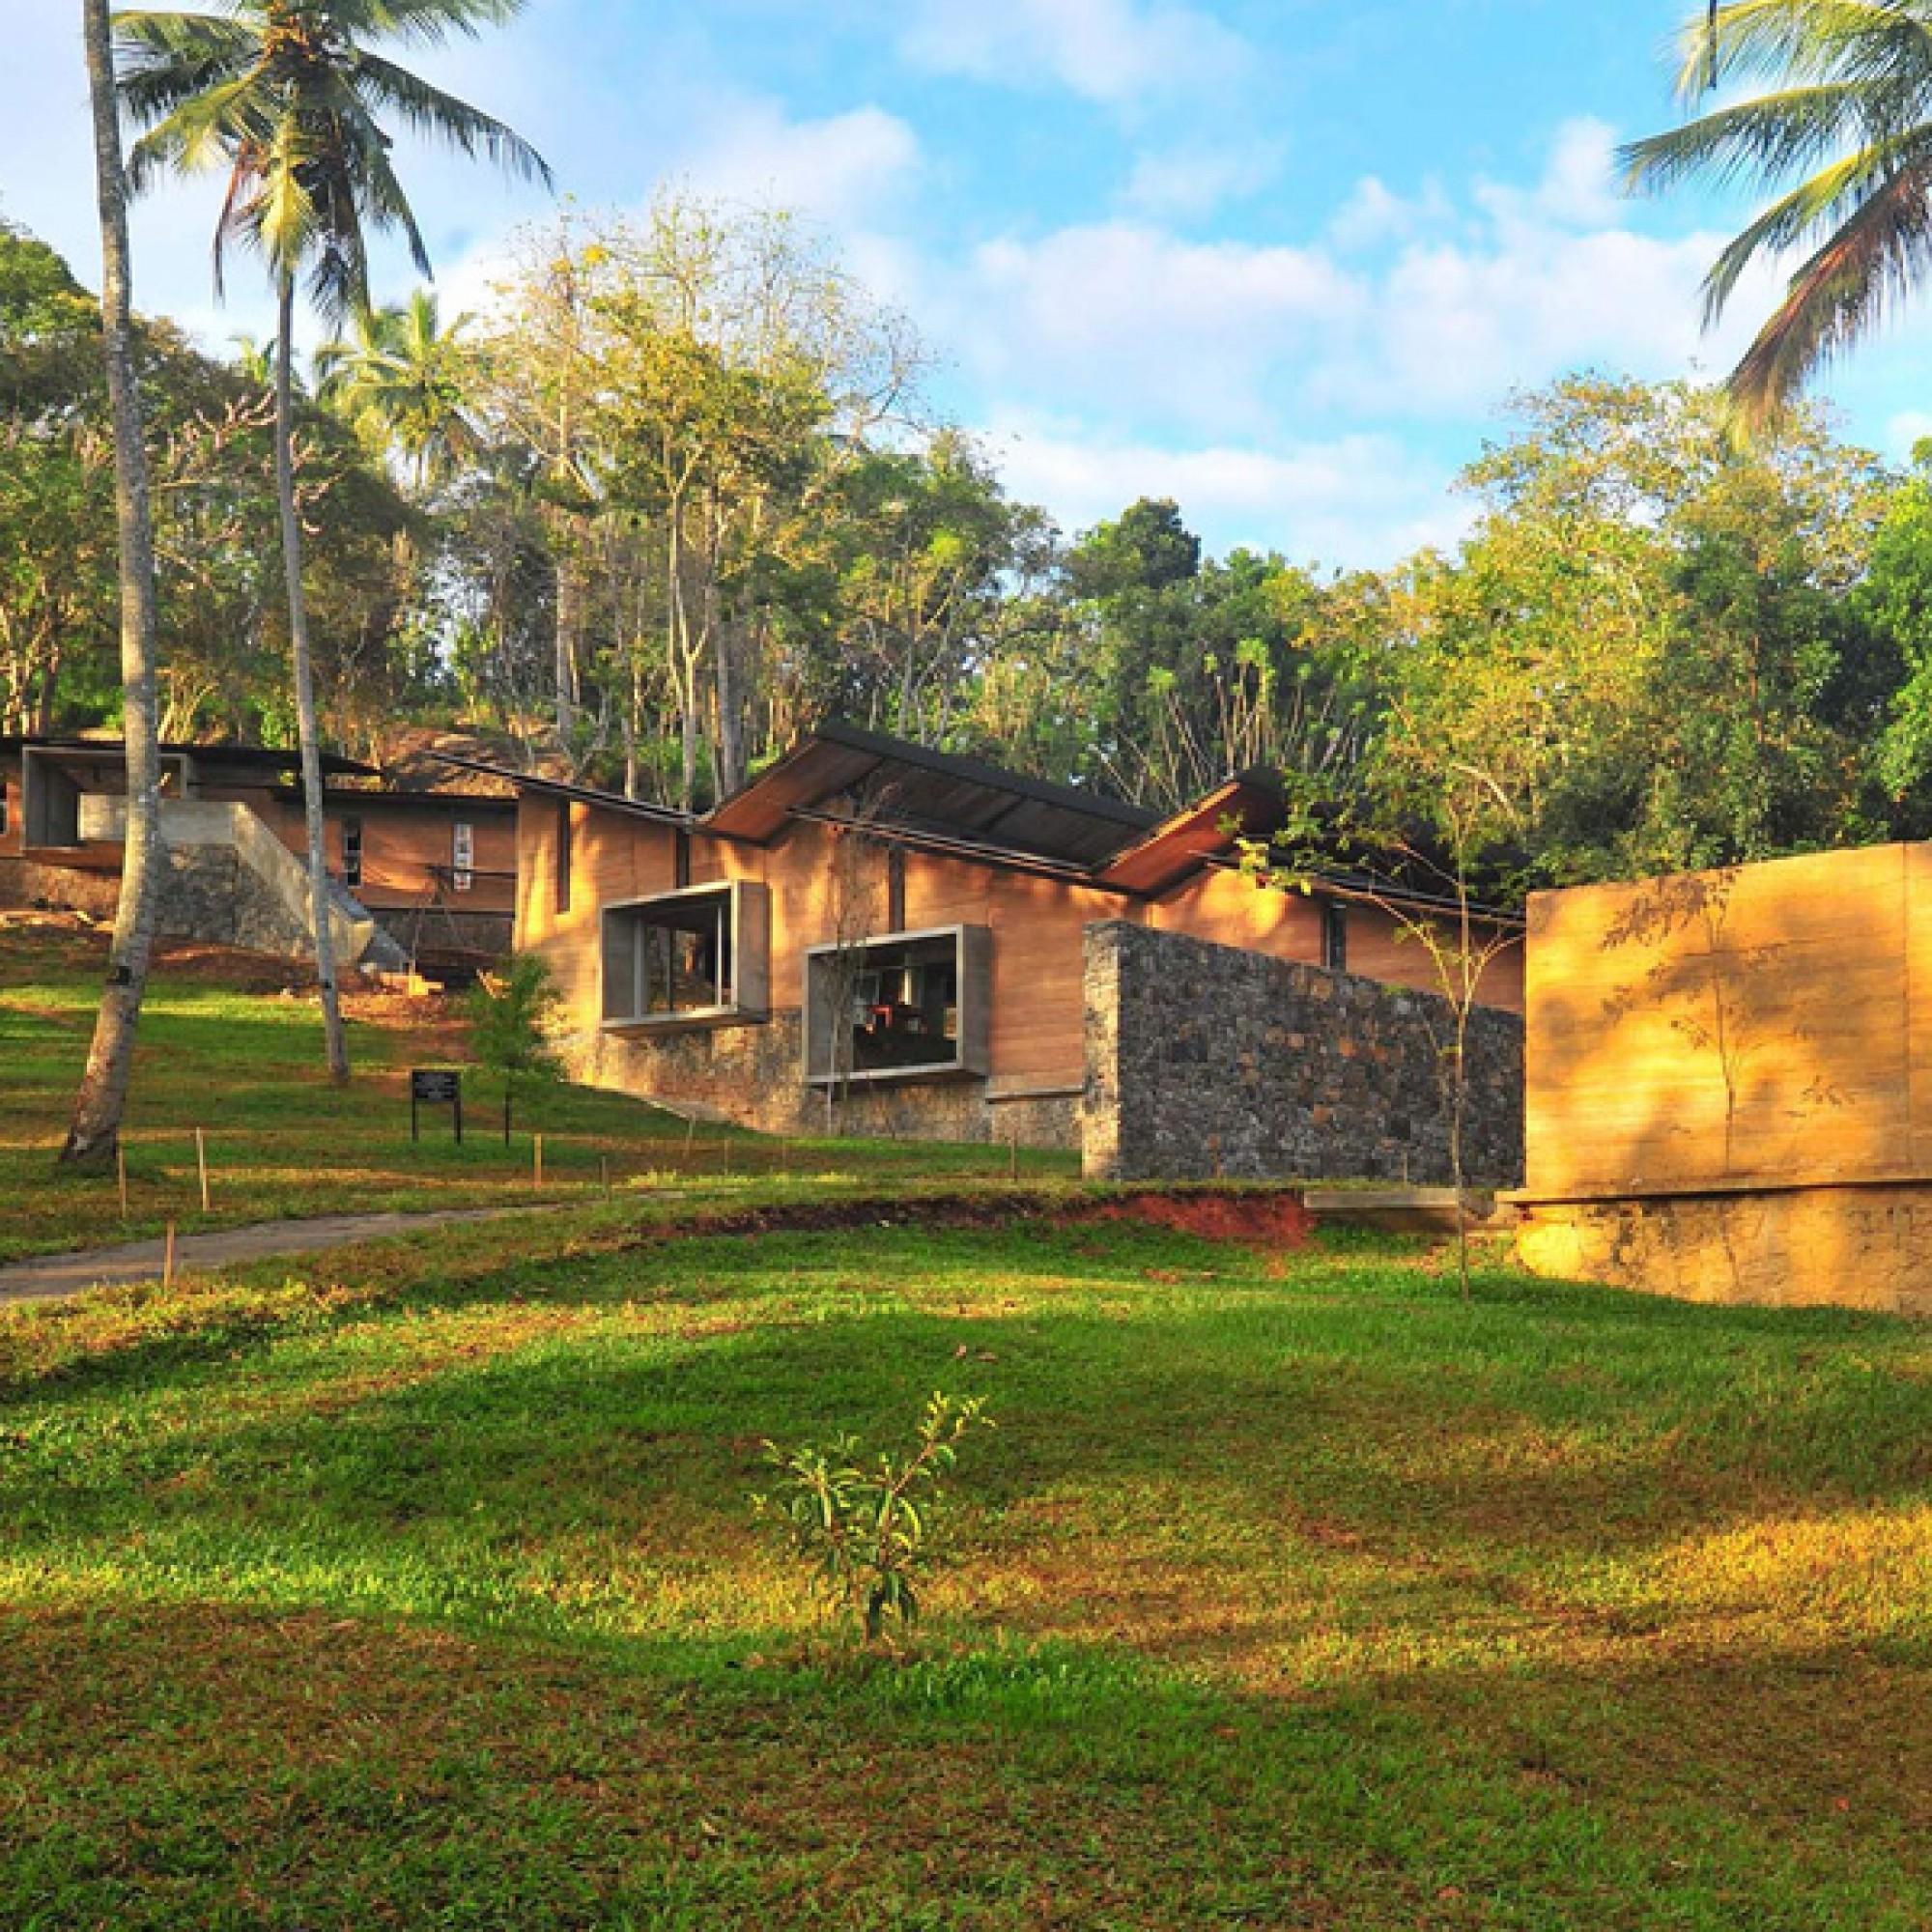 Ambepussa-Bibliothek in Sri Lanka.